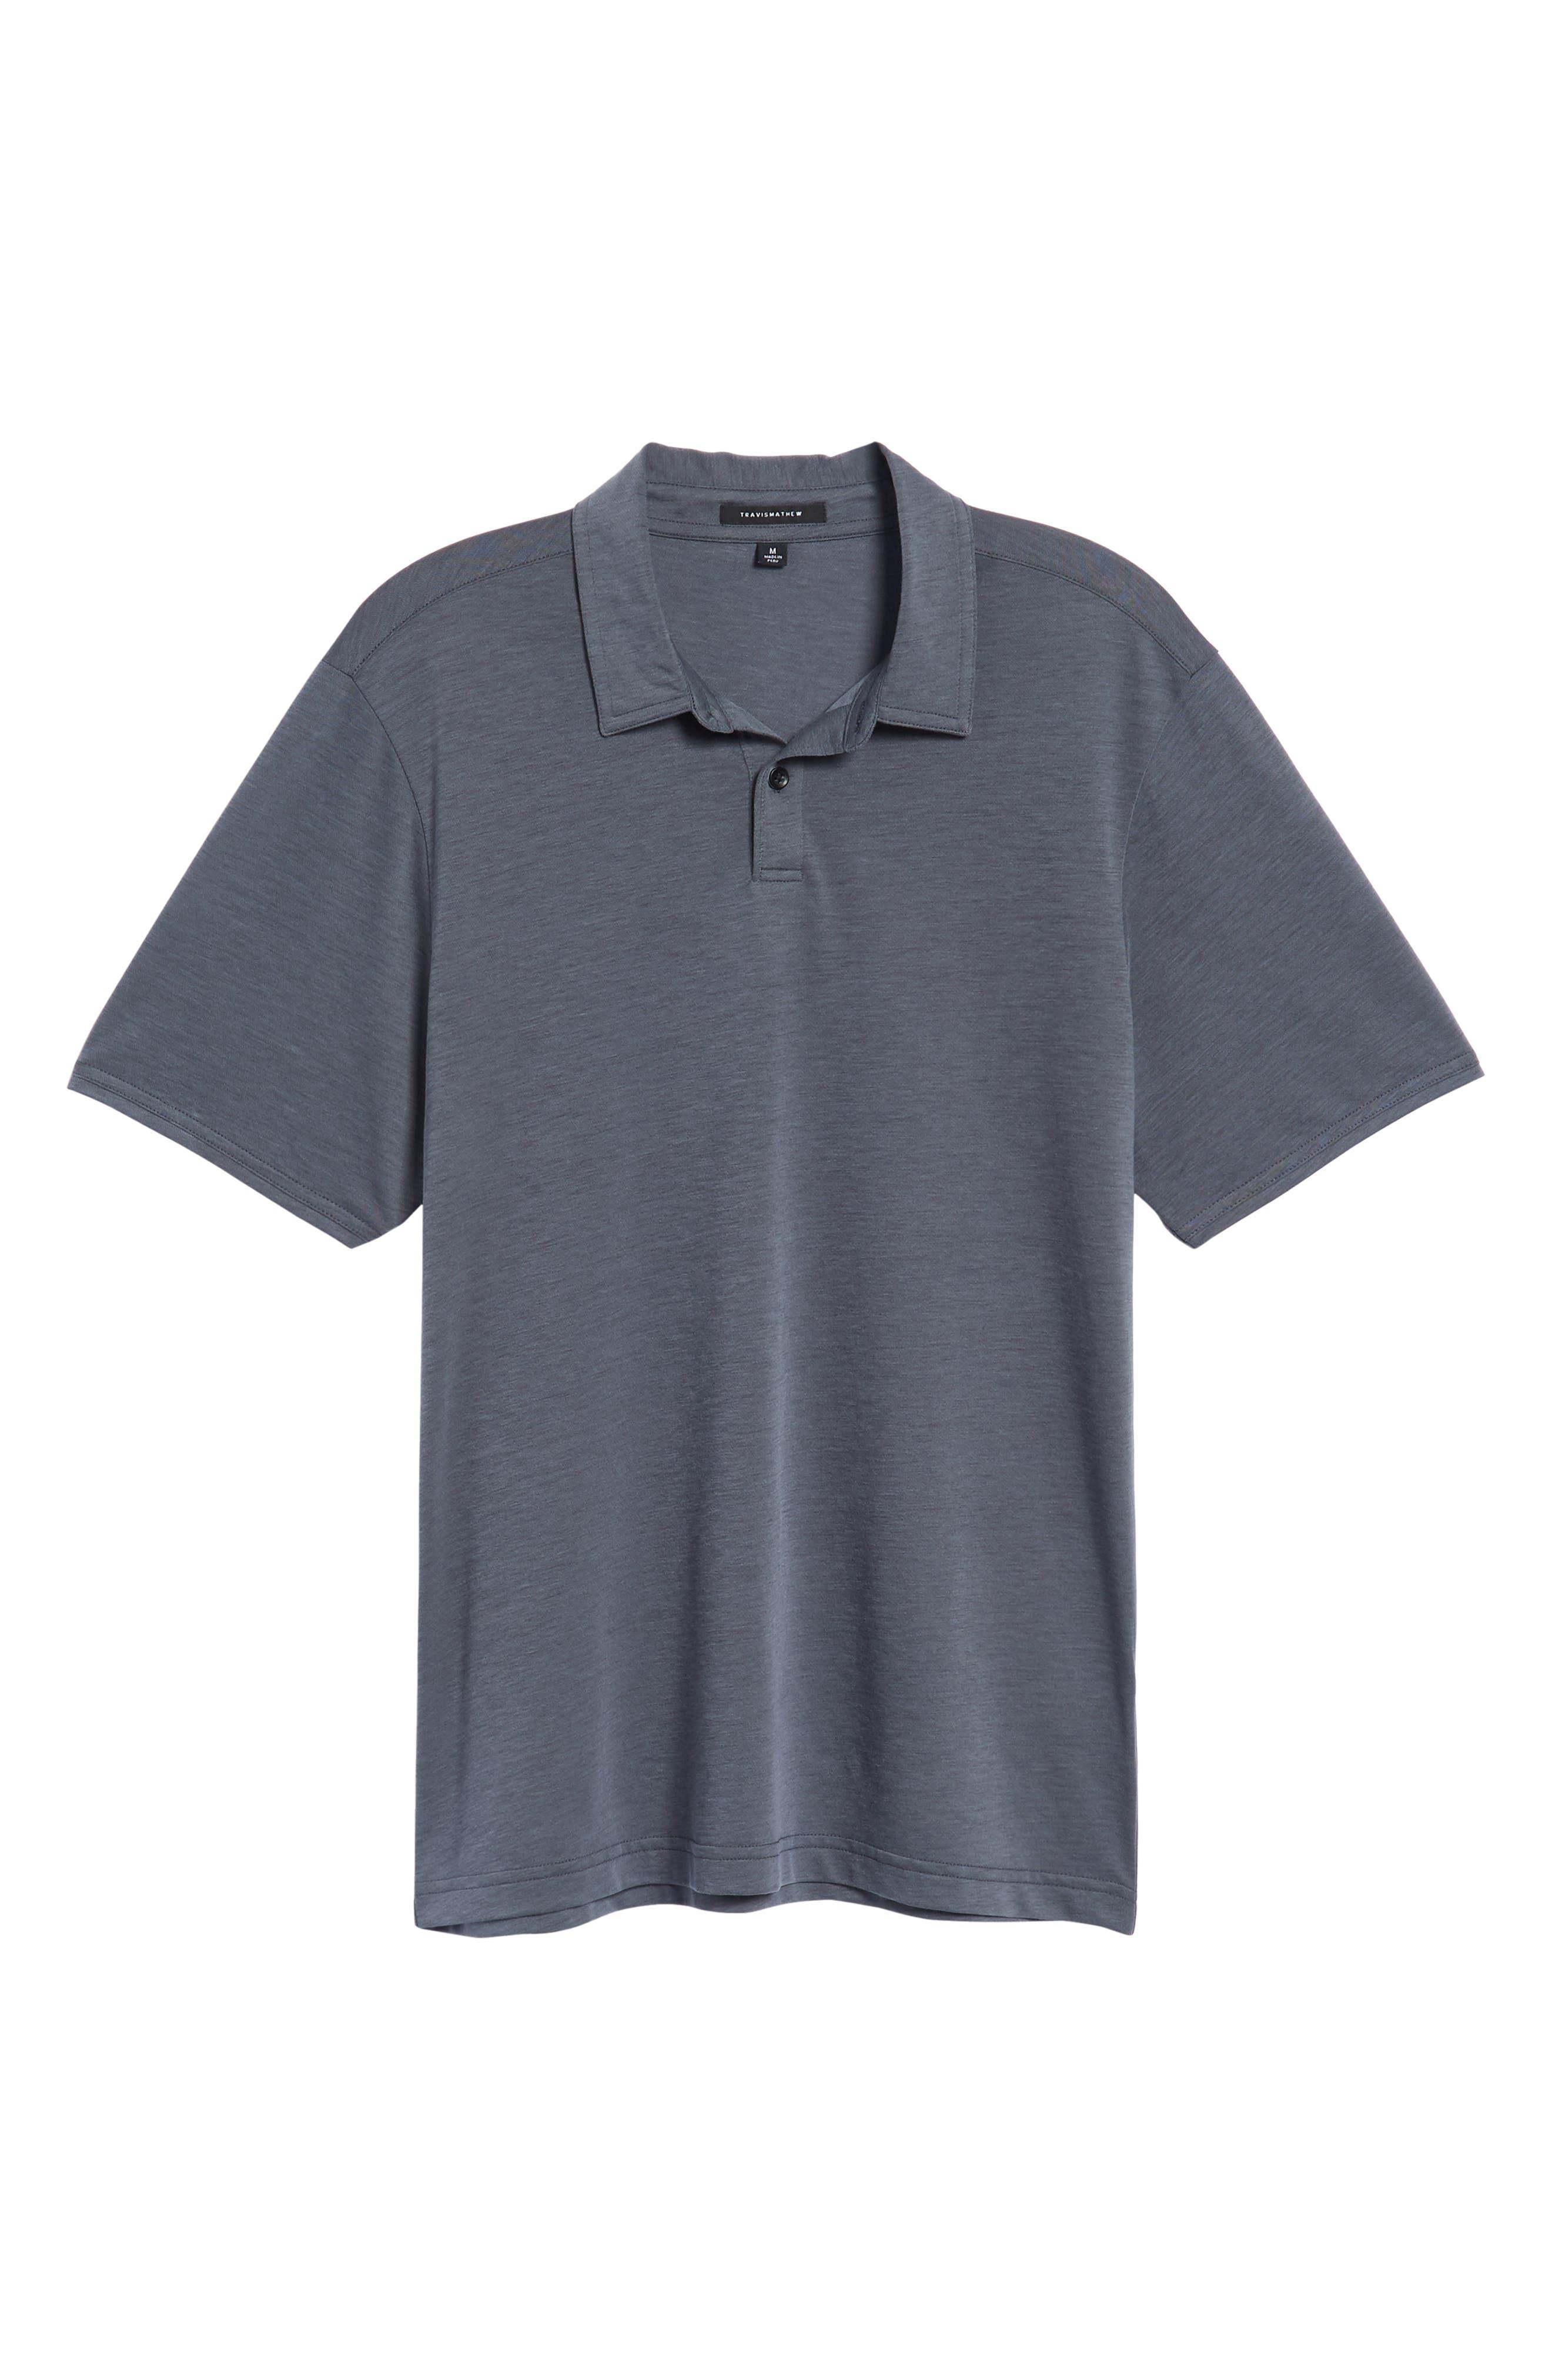 Shalene Regular Fit Polo,                             Alternate thumbnail 6, color,                             Grisaille/ Black